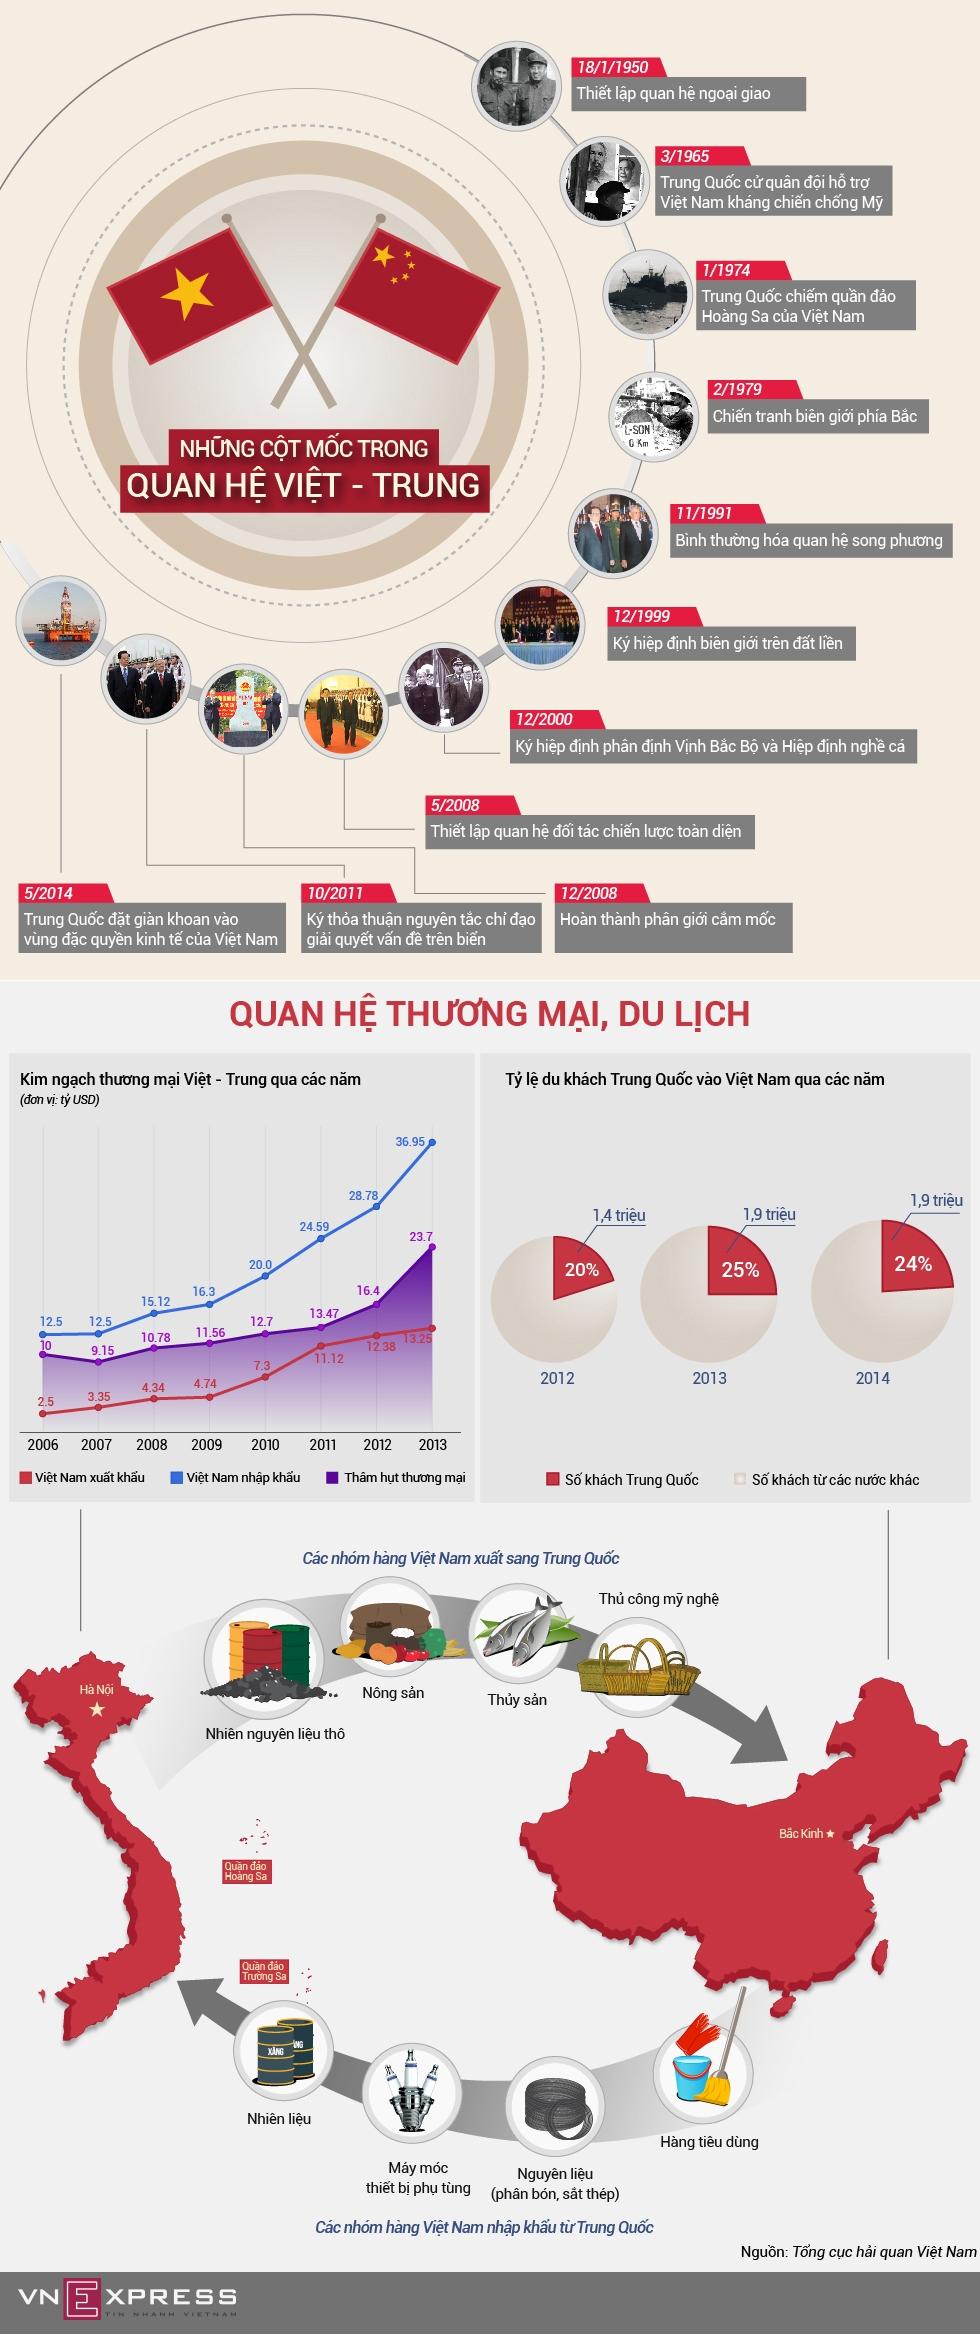 Tổng quan 65 năm quan hệ Việt - Trung qua những con số